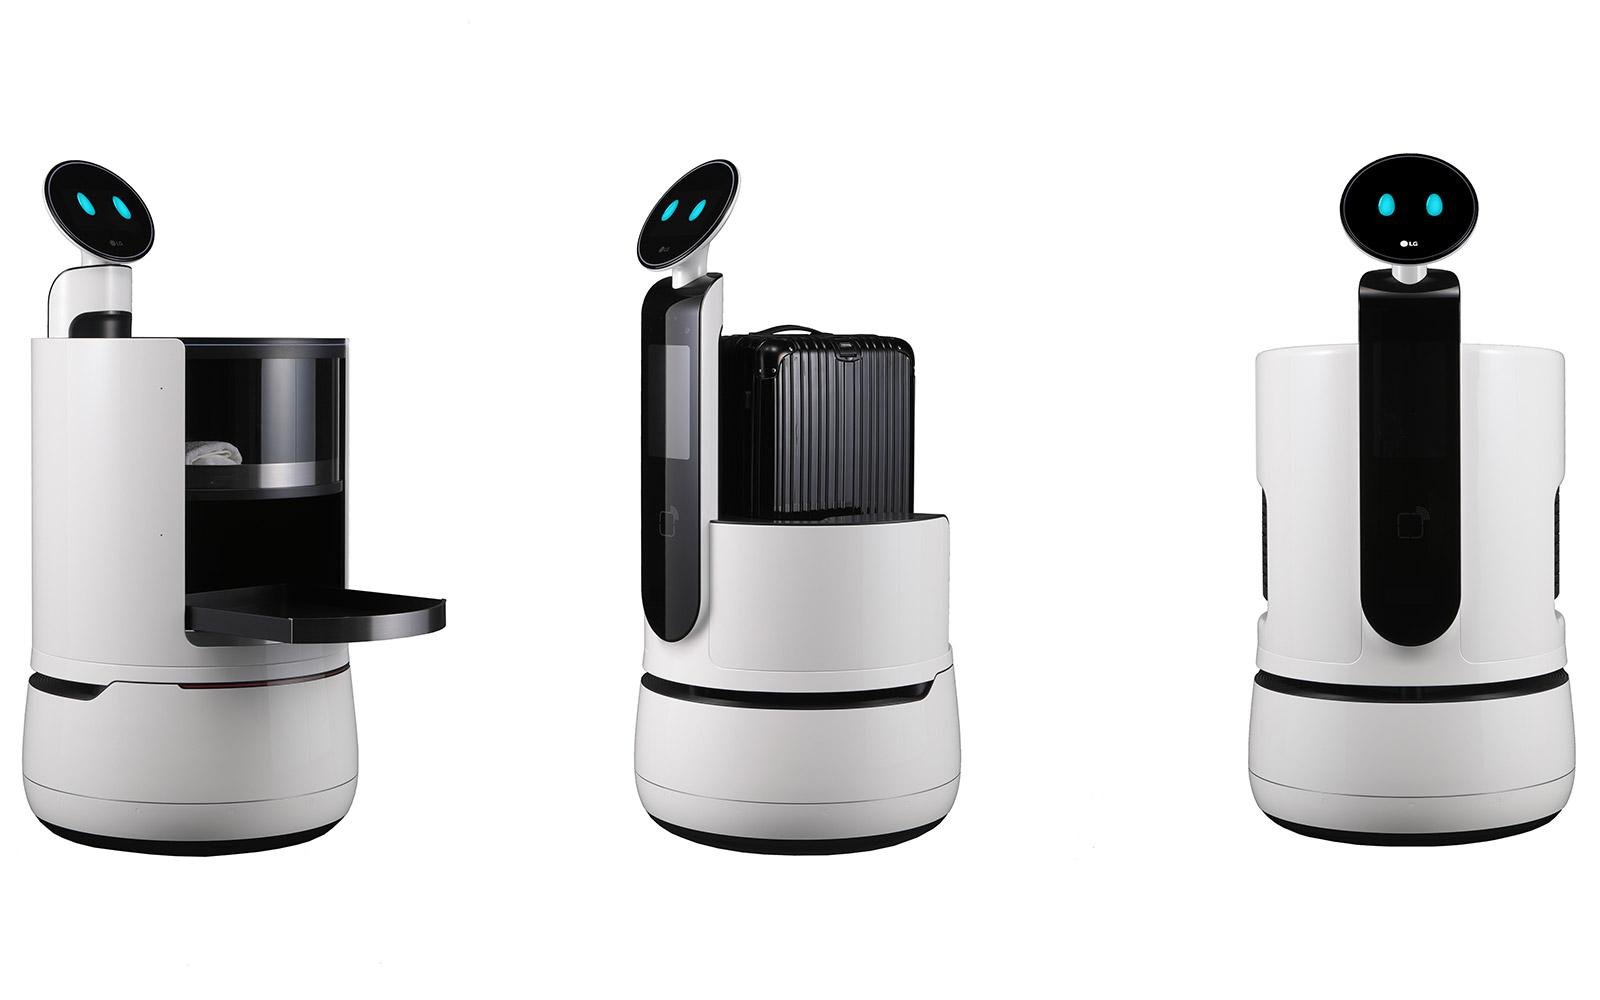 CLOi: LG bringt drei neue Roboter zur CES